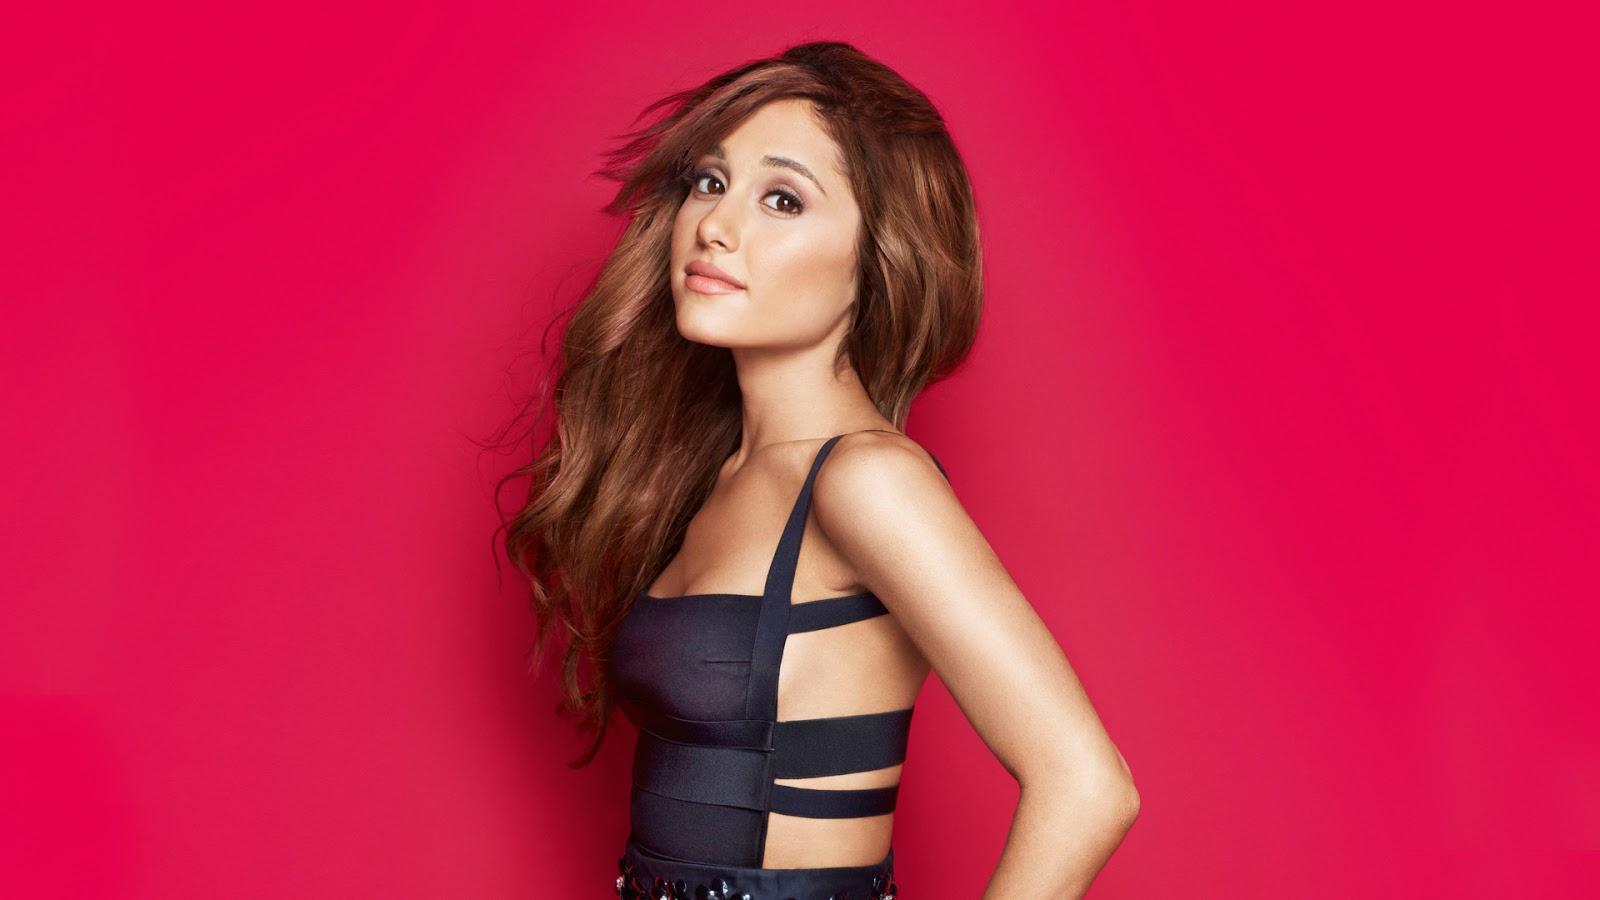 Ariana grande in black dress hd wallpaperstillphotoshoot full hd ariana grande download ariana grande wallpaper voltagebd Choice Image